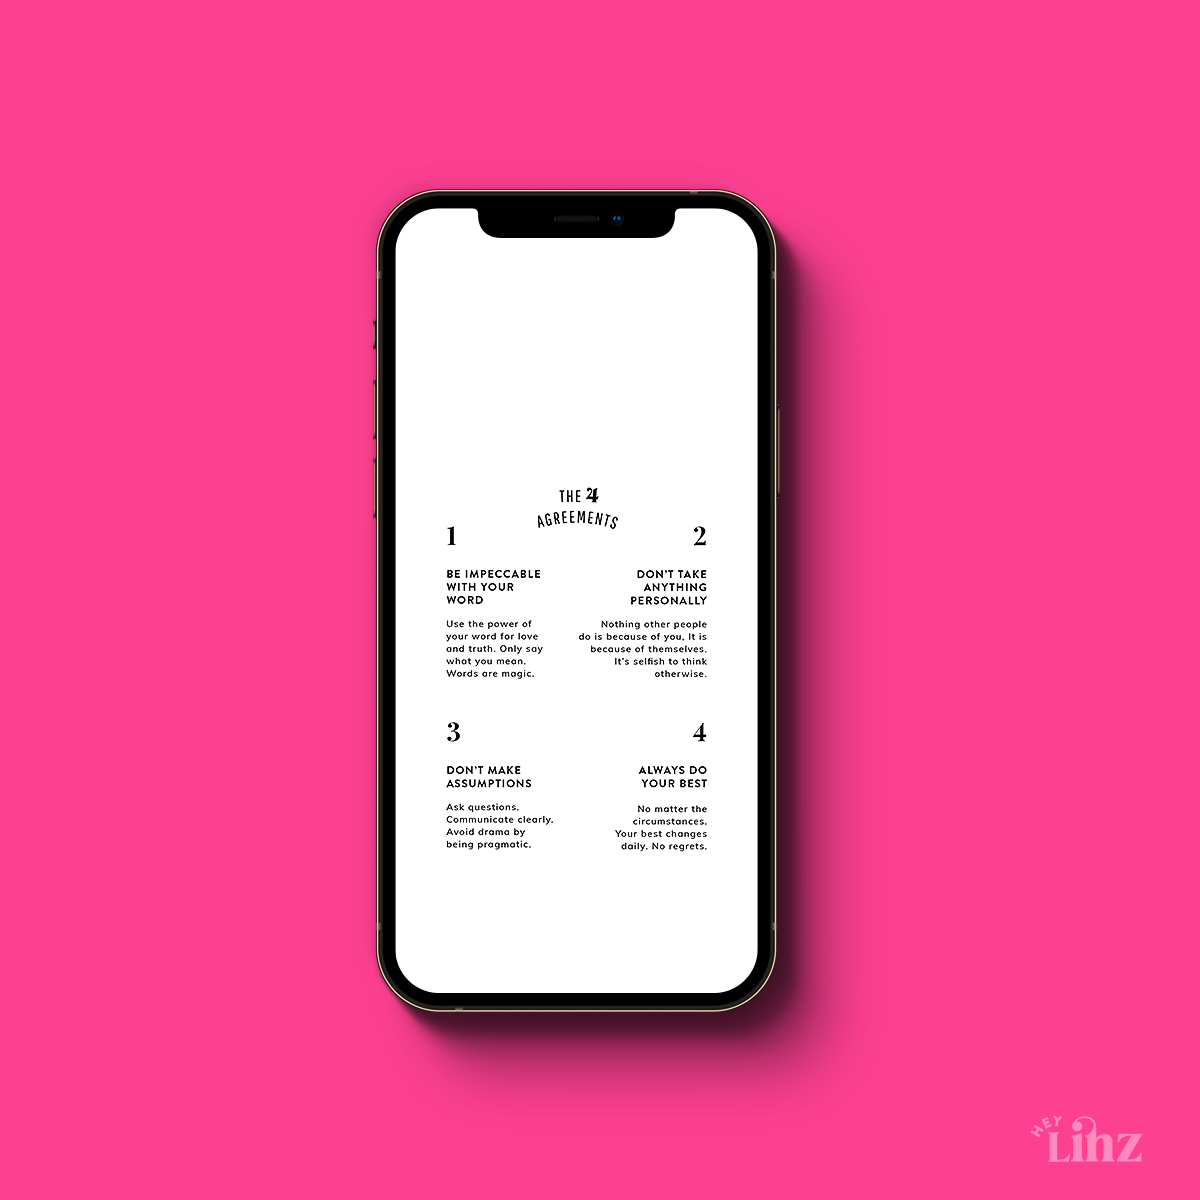 Four Agreements Phone Wallpaper and Lockscreen